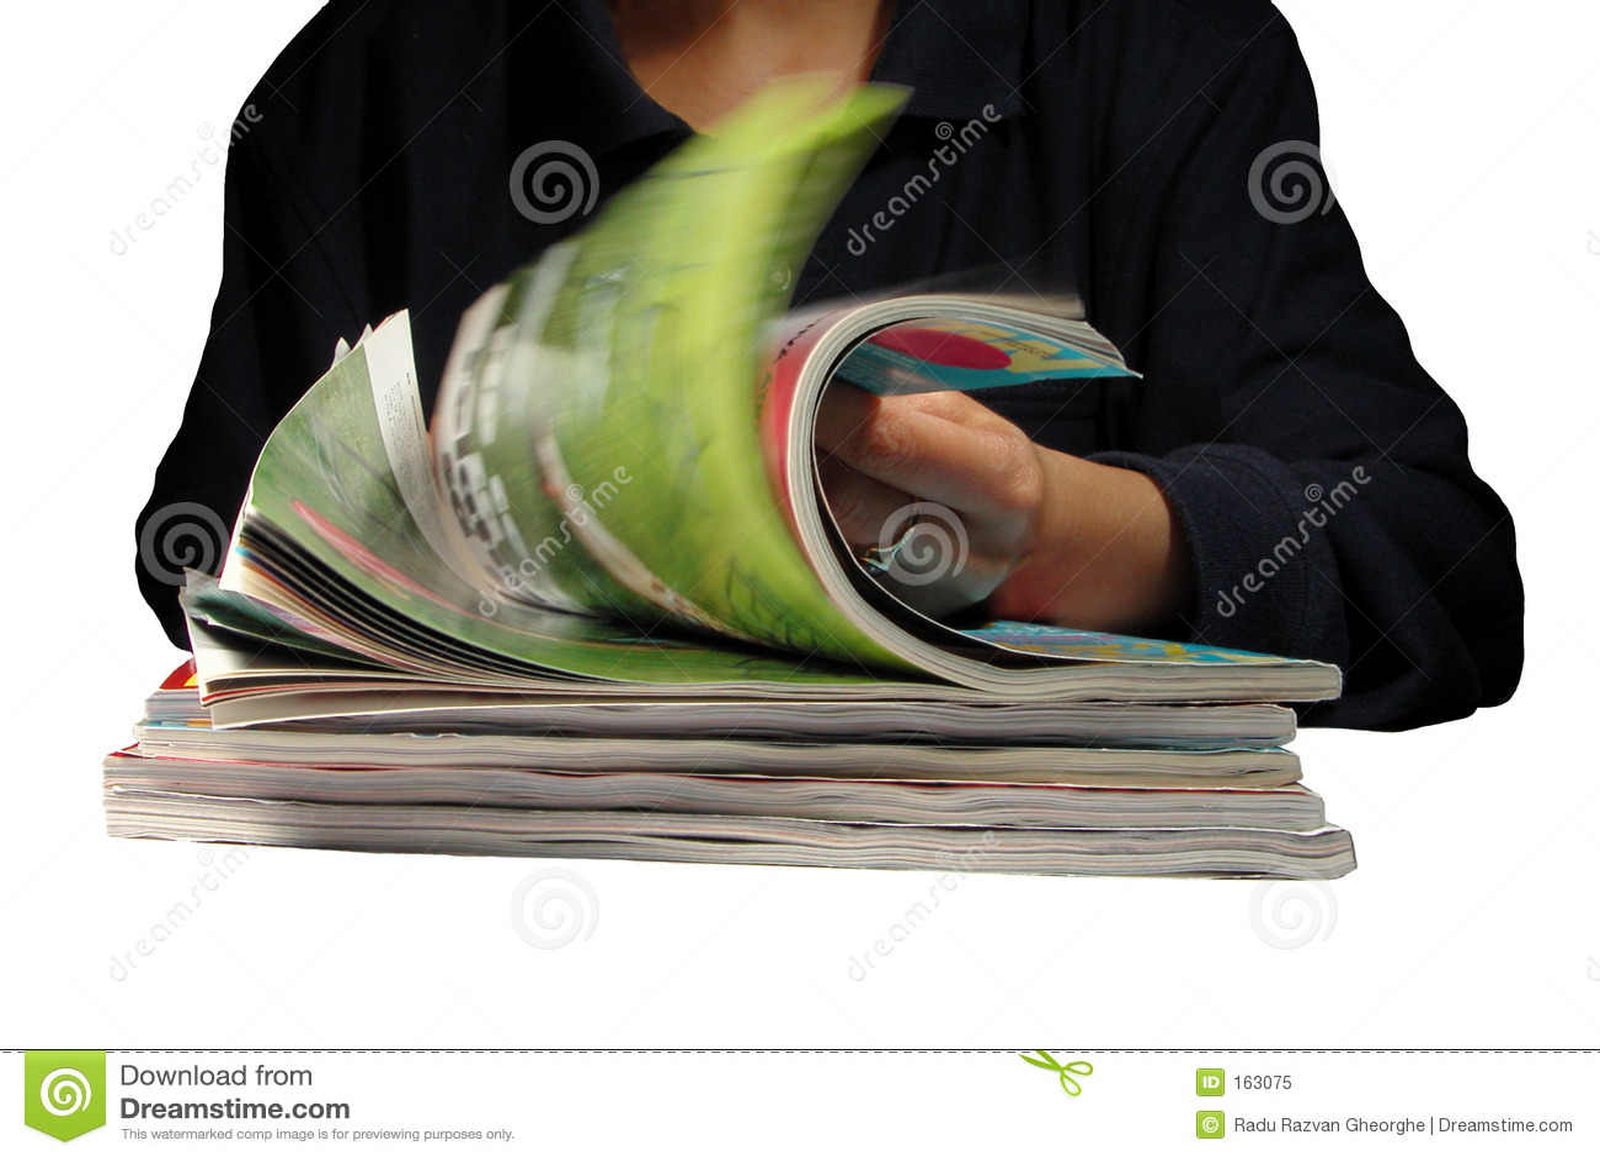 Riffling through magazines